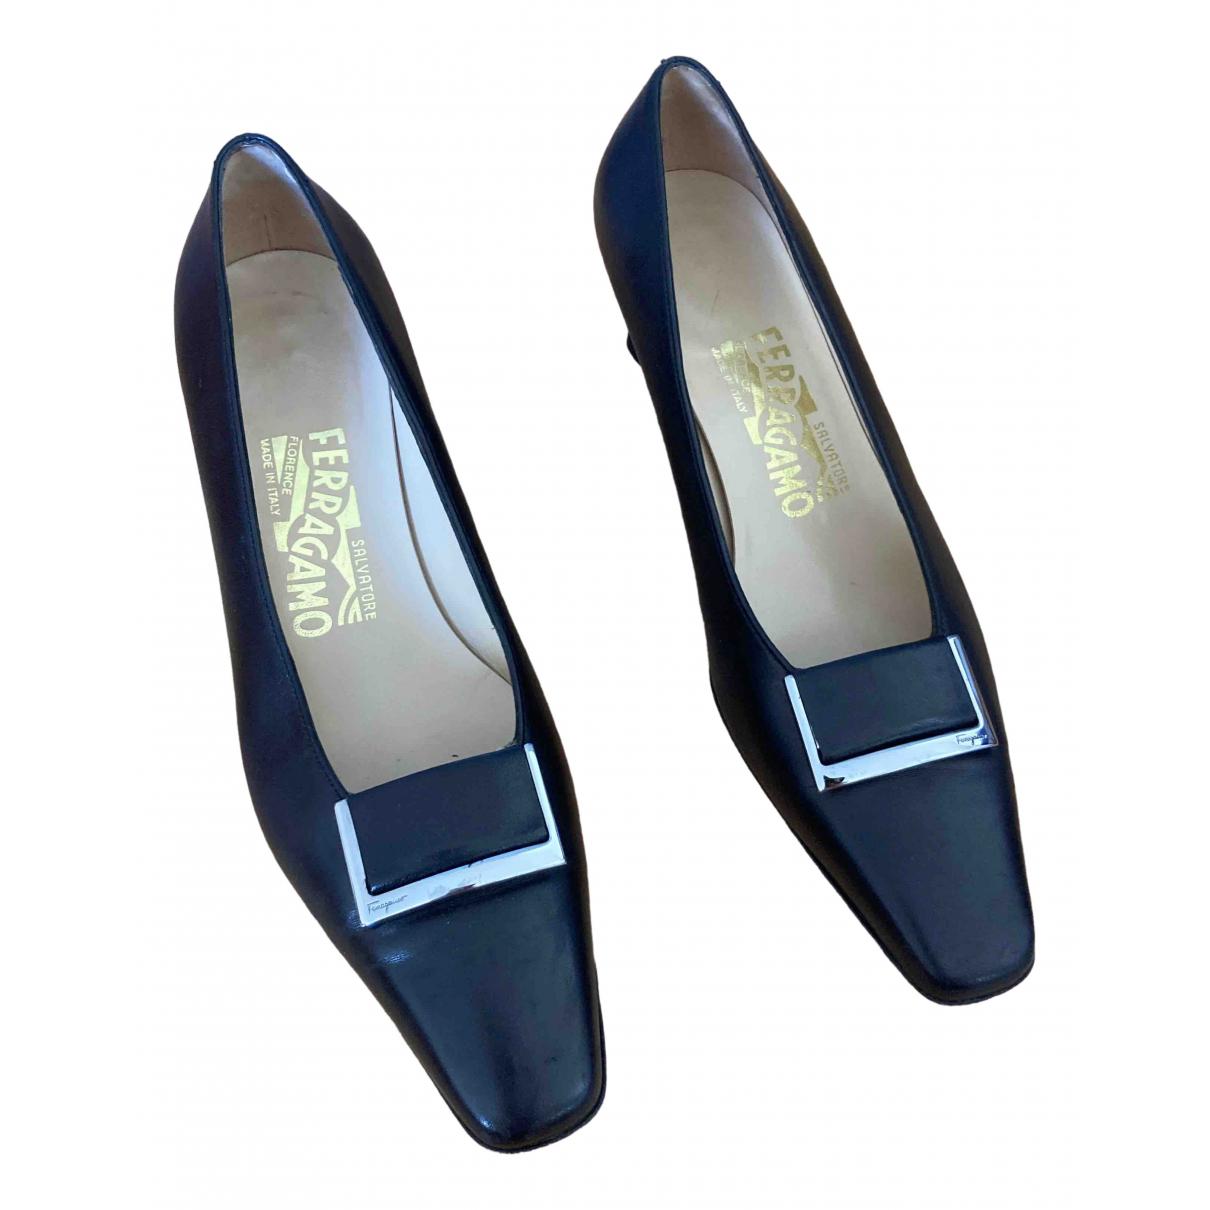 Salvatore Ferragamo N Black Leather Heels for Women 6.5 US